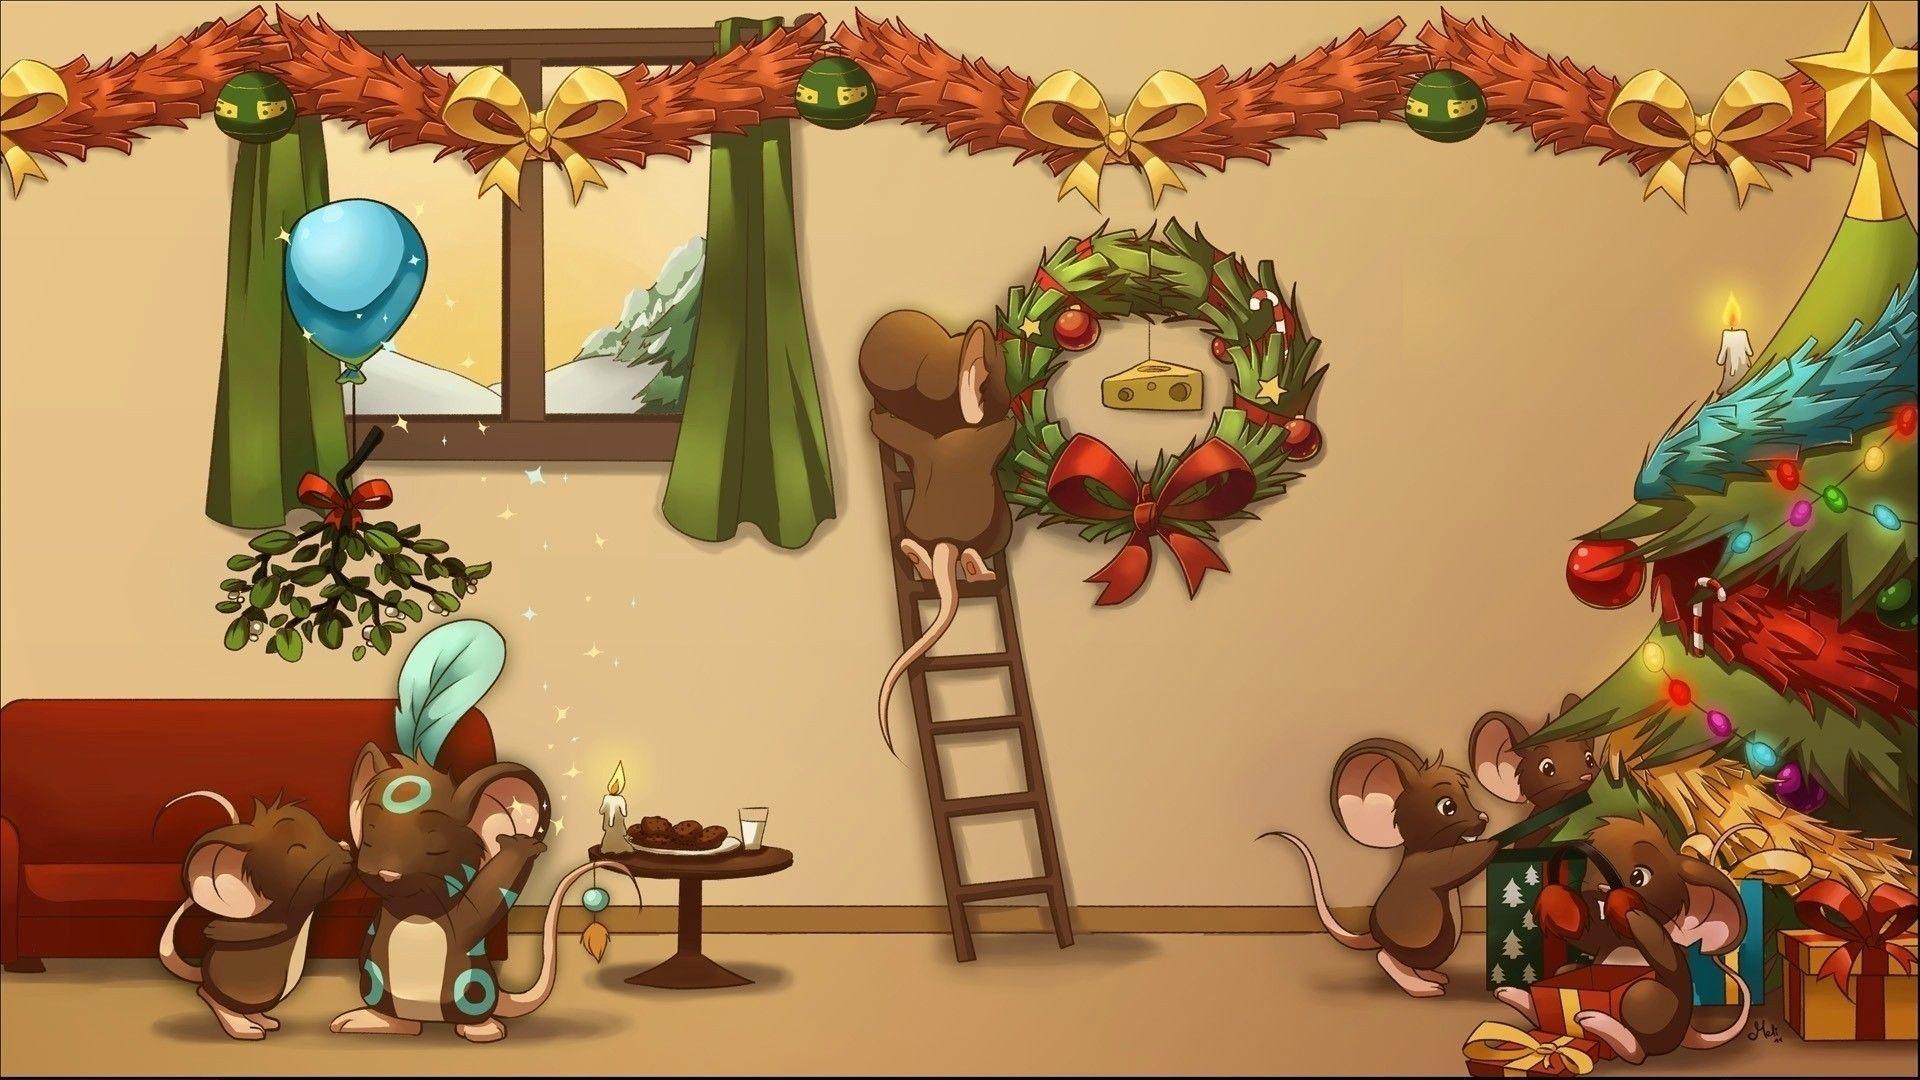 Transformice Christmas 2020 Video games christmas transformice wallpaper in 2020   Cartoon